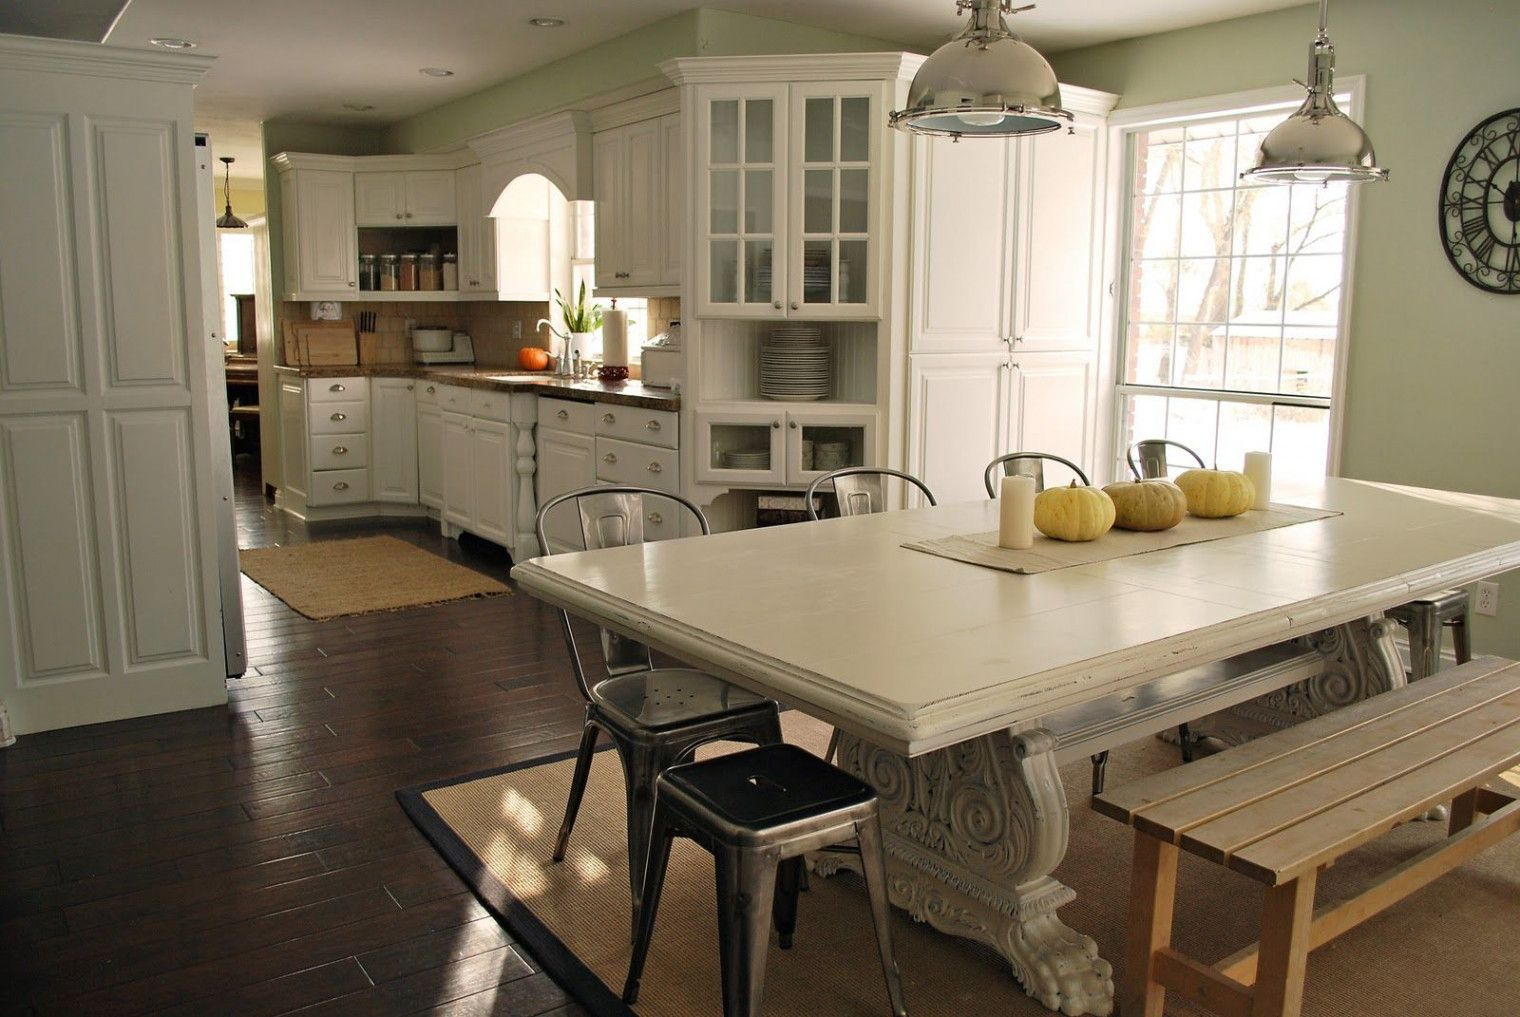 Unique Kitchen Table Gardenweb em 9